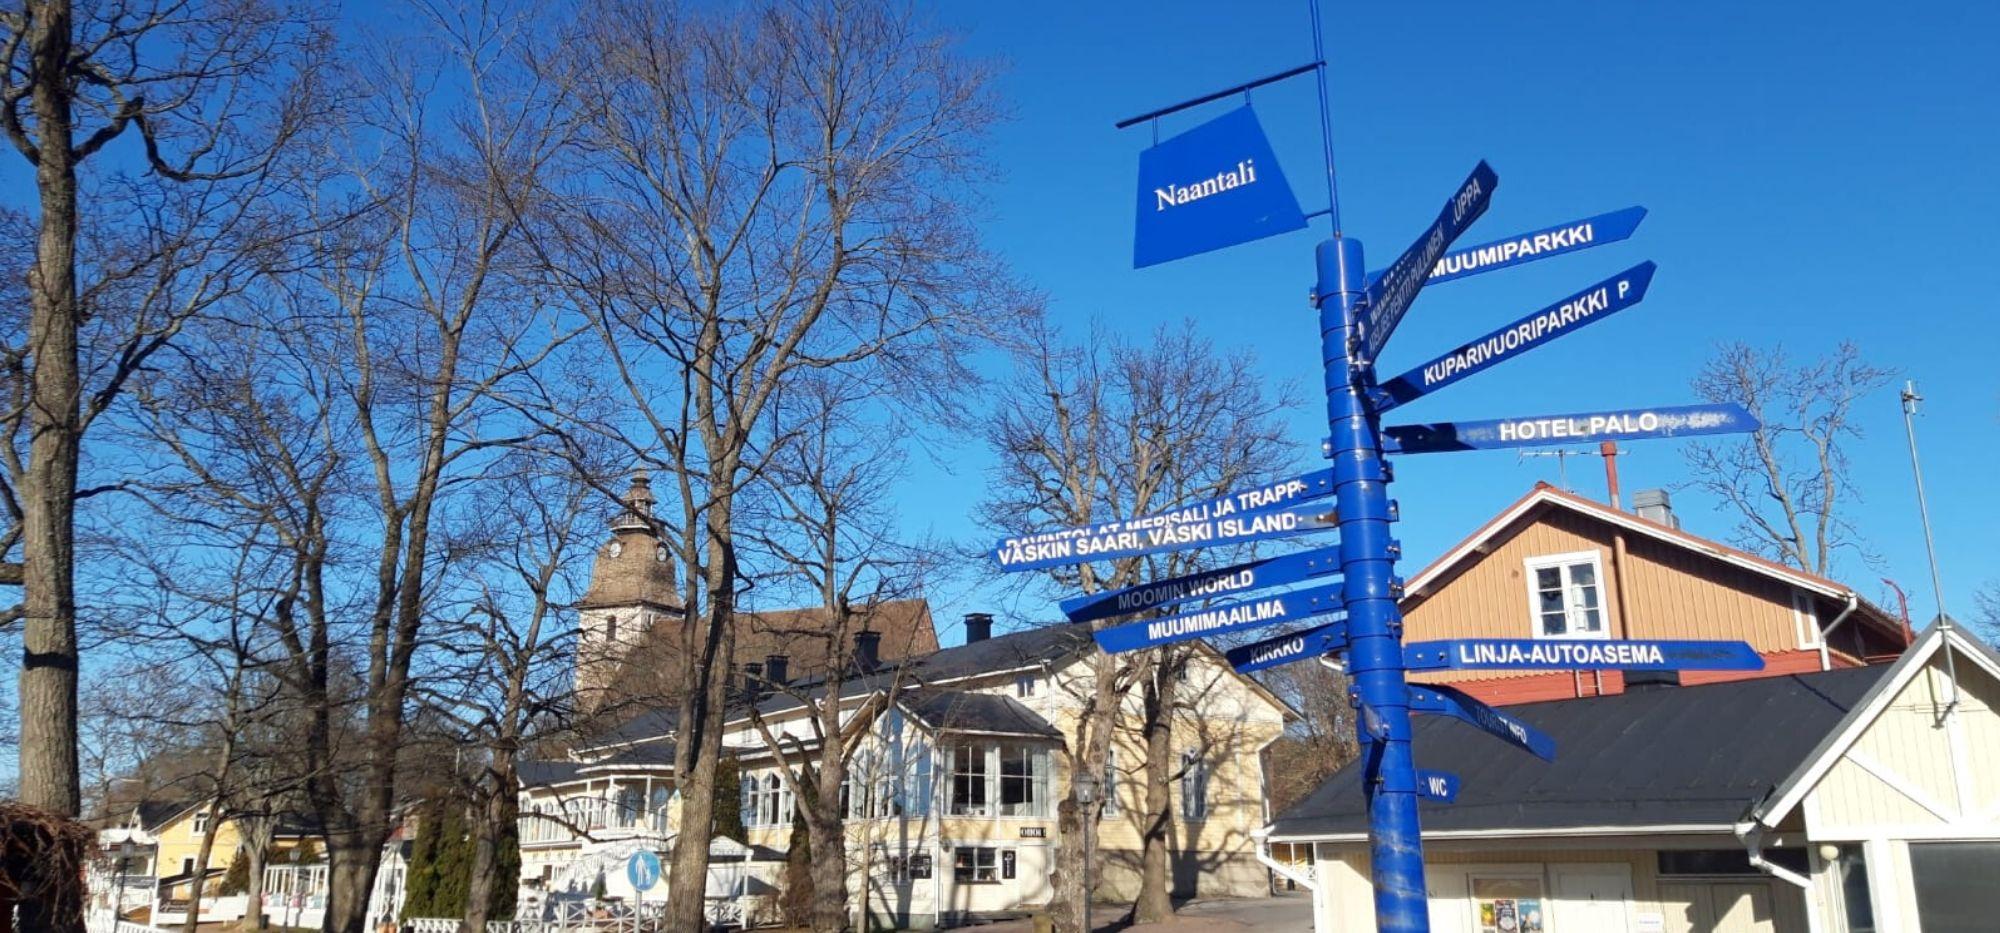 Finlandia Naantali